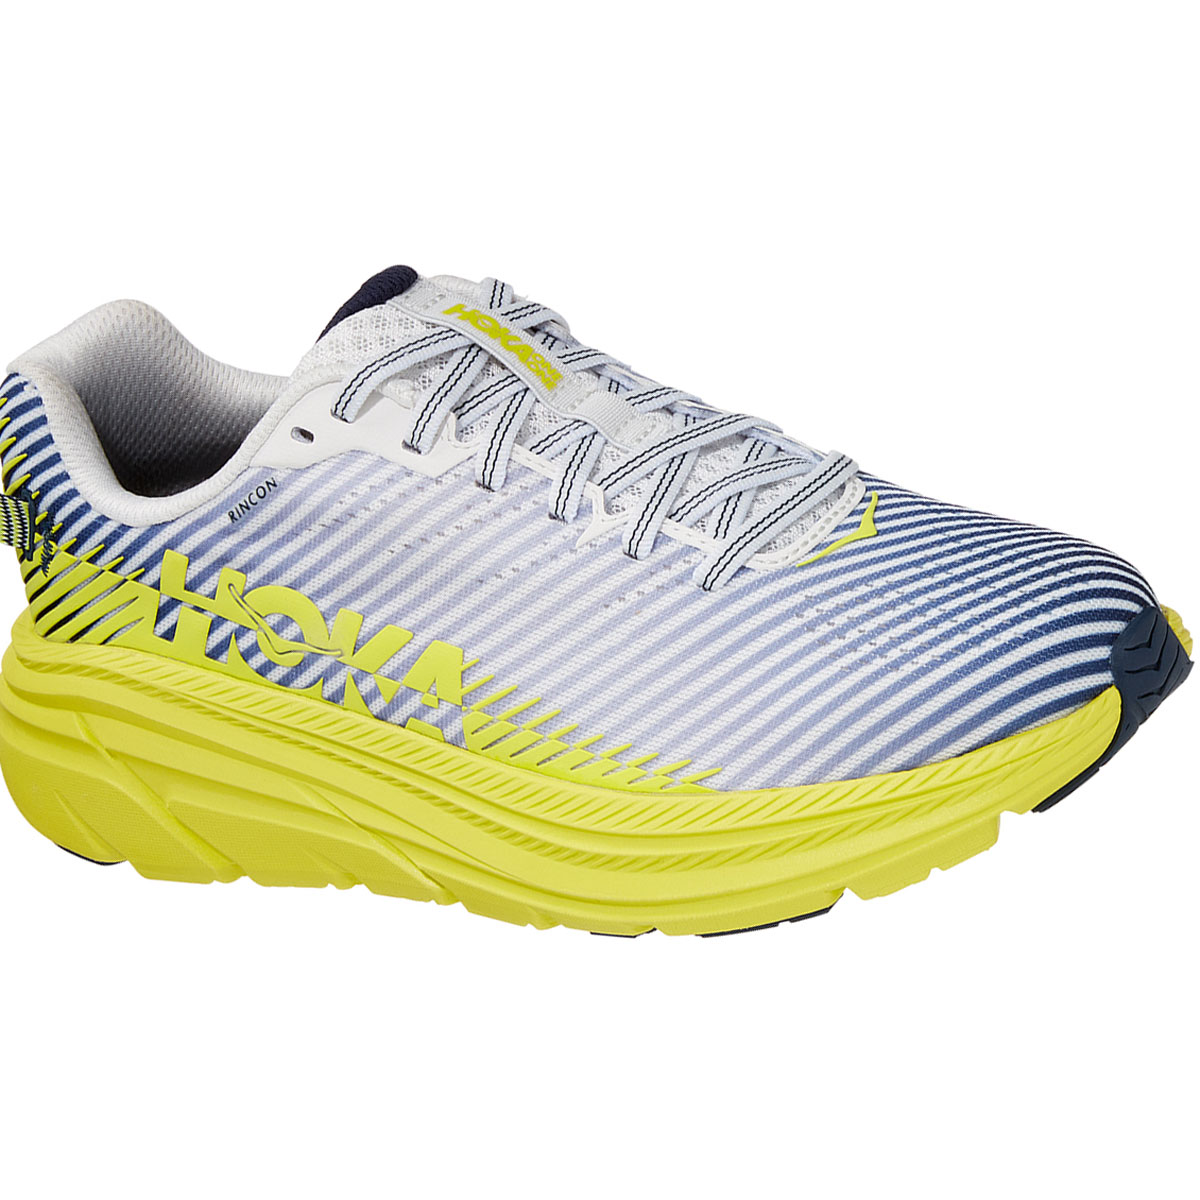 Women's Hoka One One Rincon 2 Running Shoe - Color: Blanc De Blanc - Size: 5.5 - Width: Regular, Blanc De Blanc, large, image 2